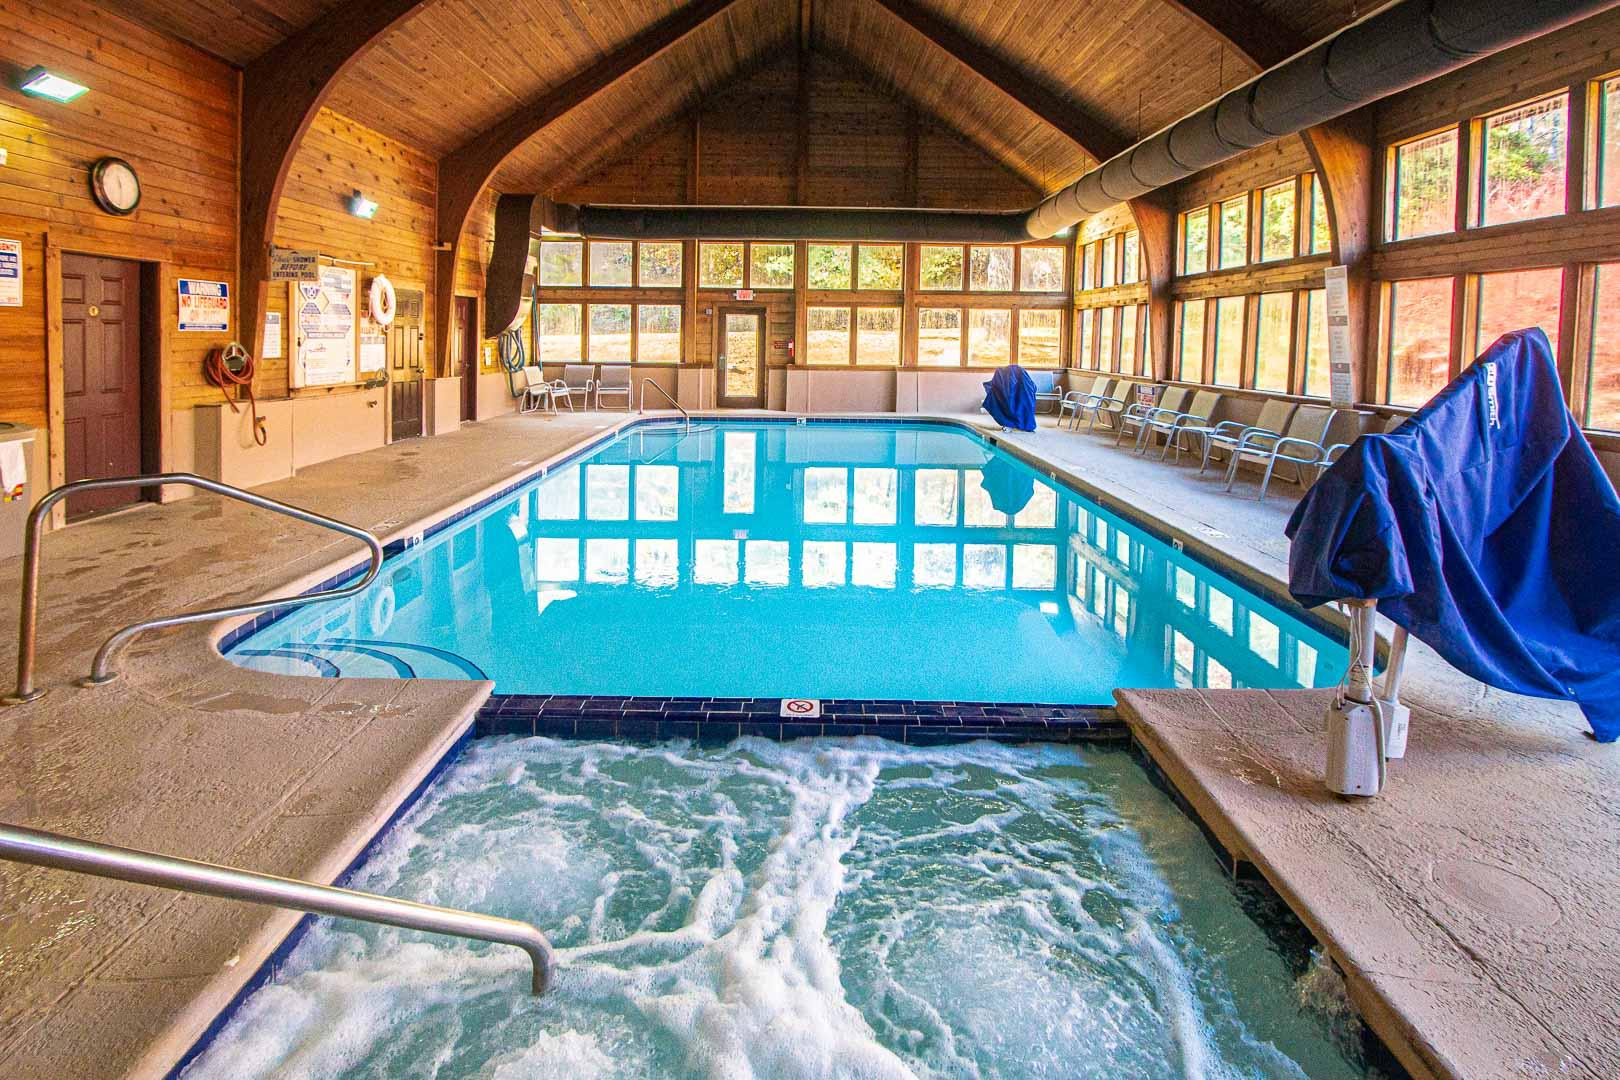 A quaint indoor swimming pool and Jacuzzi tub at VRI's Fox Run Resort in North Carolina.